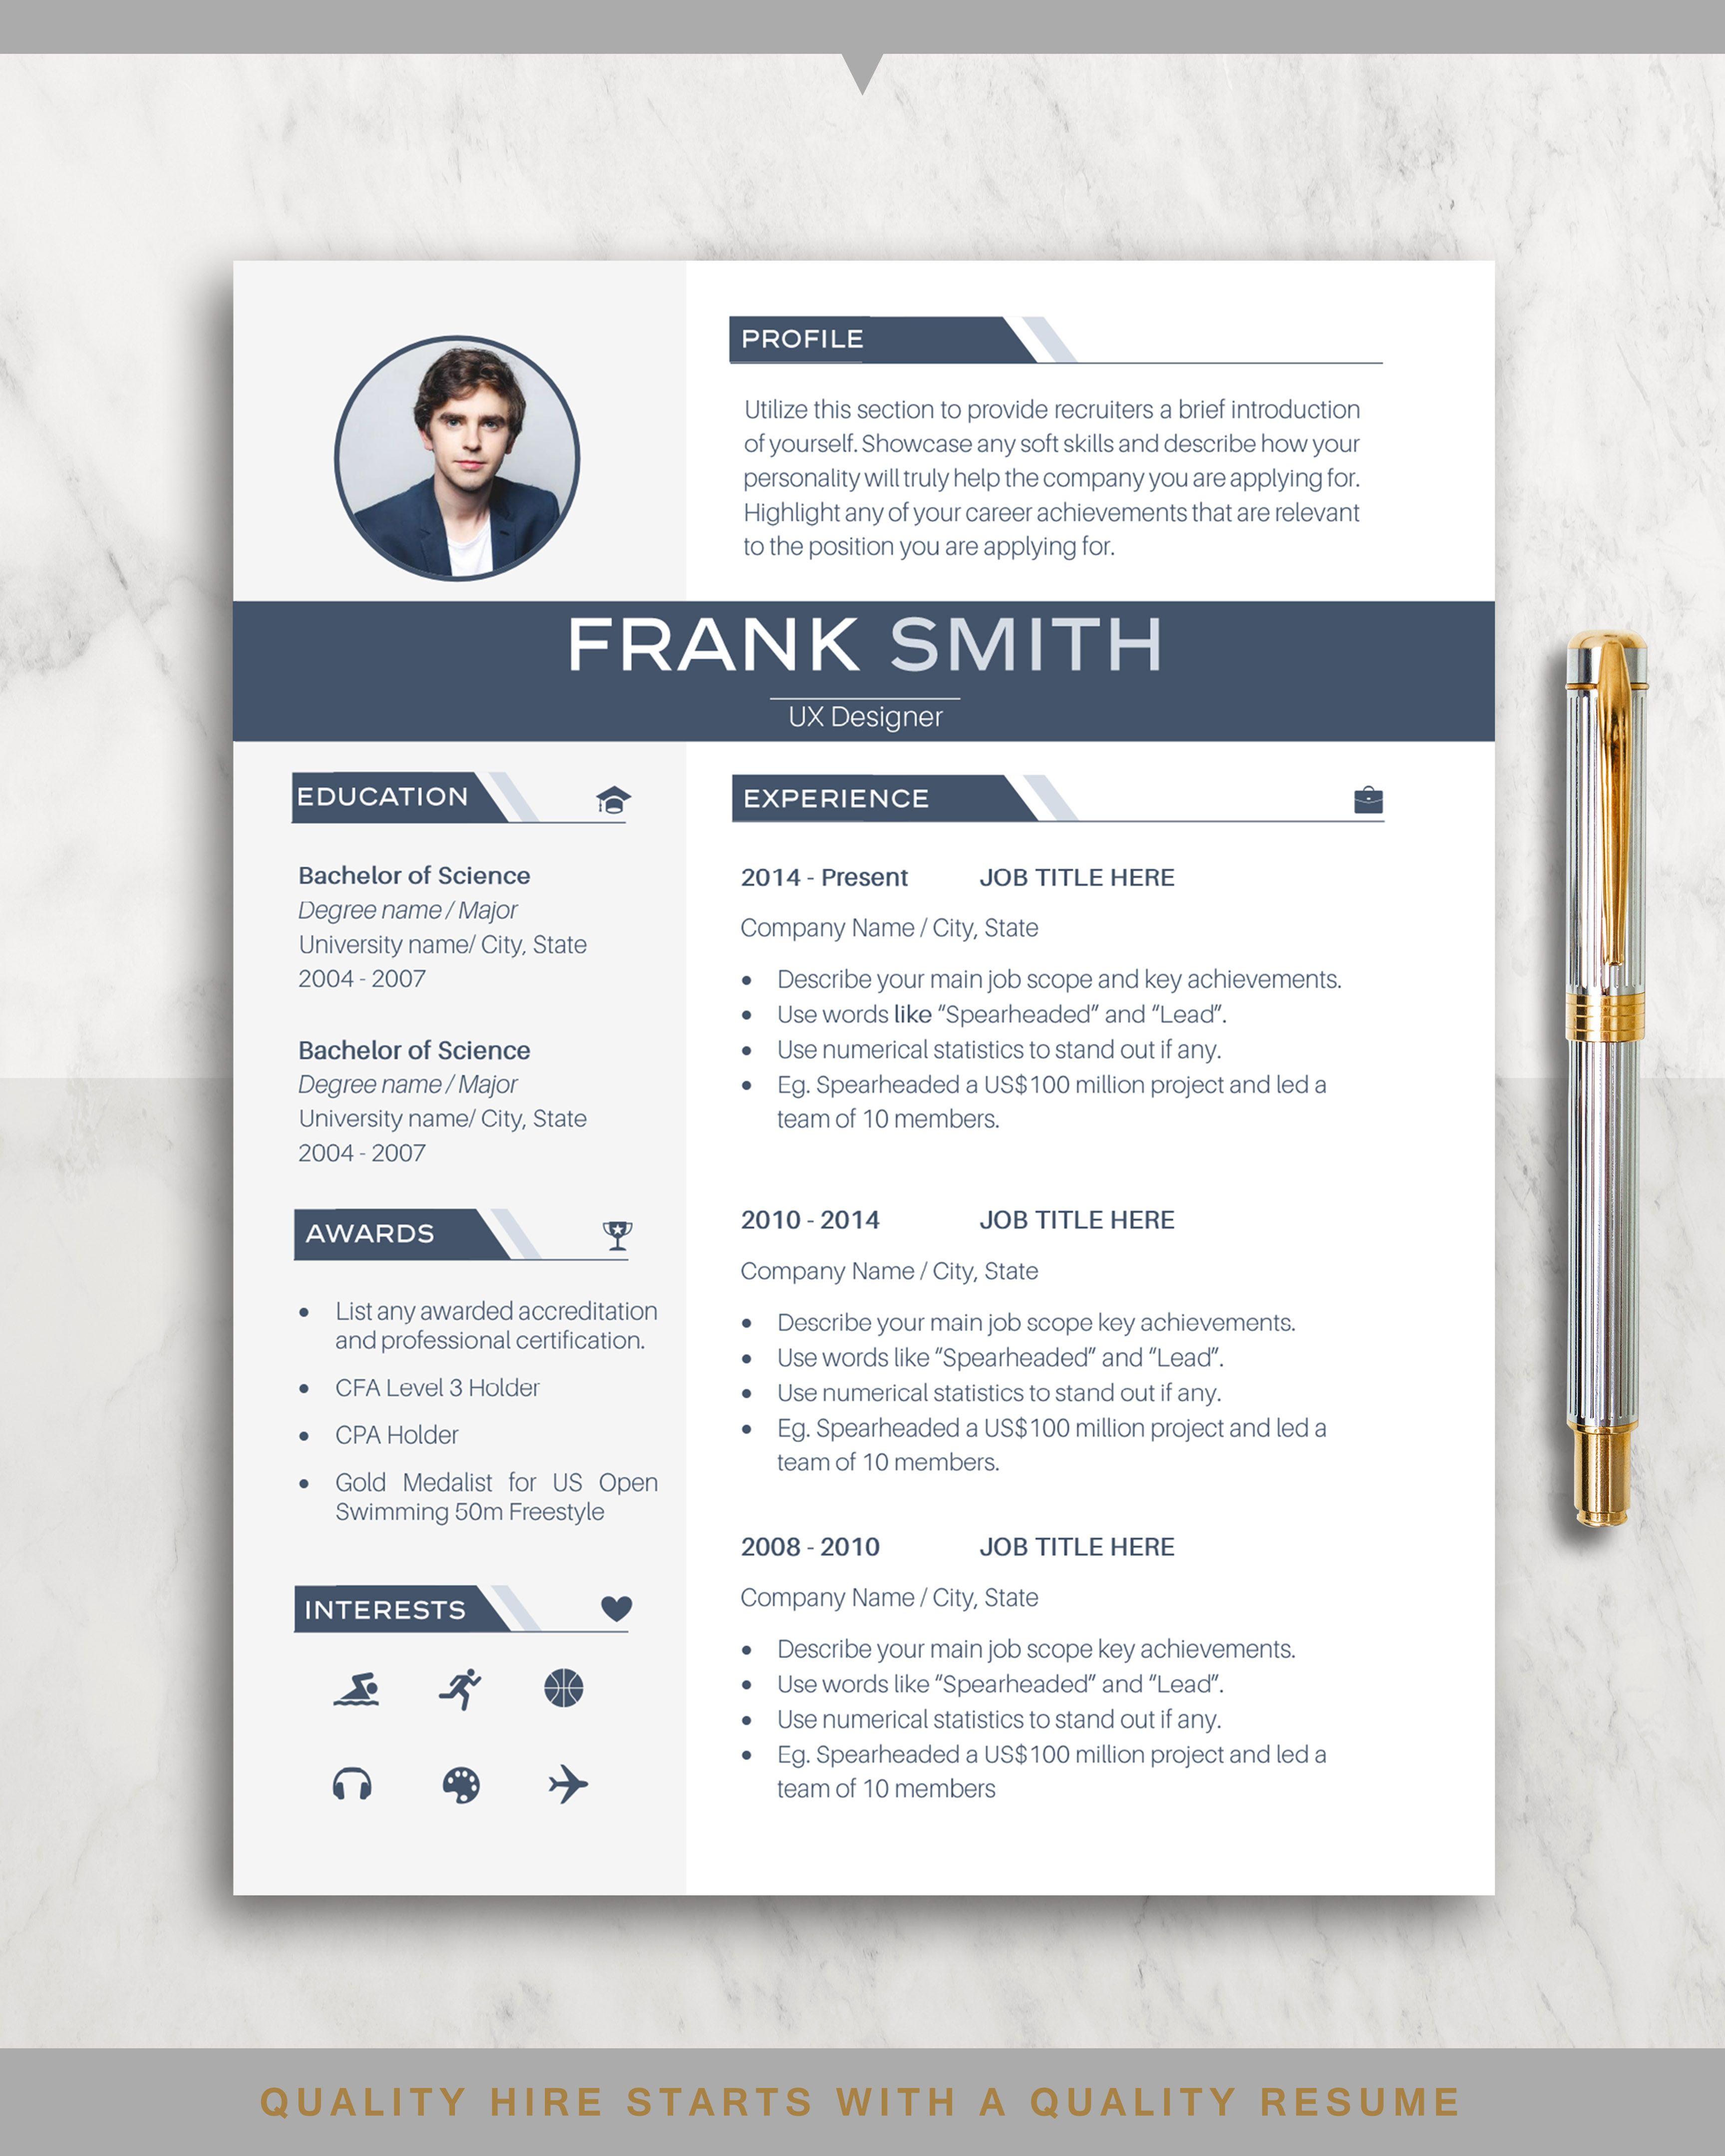 Resume Template Cv Template Professional Resume Templates Creative Modern Minimalist Design In 2020 Resume Template Professional Cv Template Resume Template